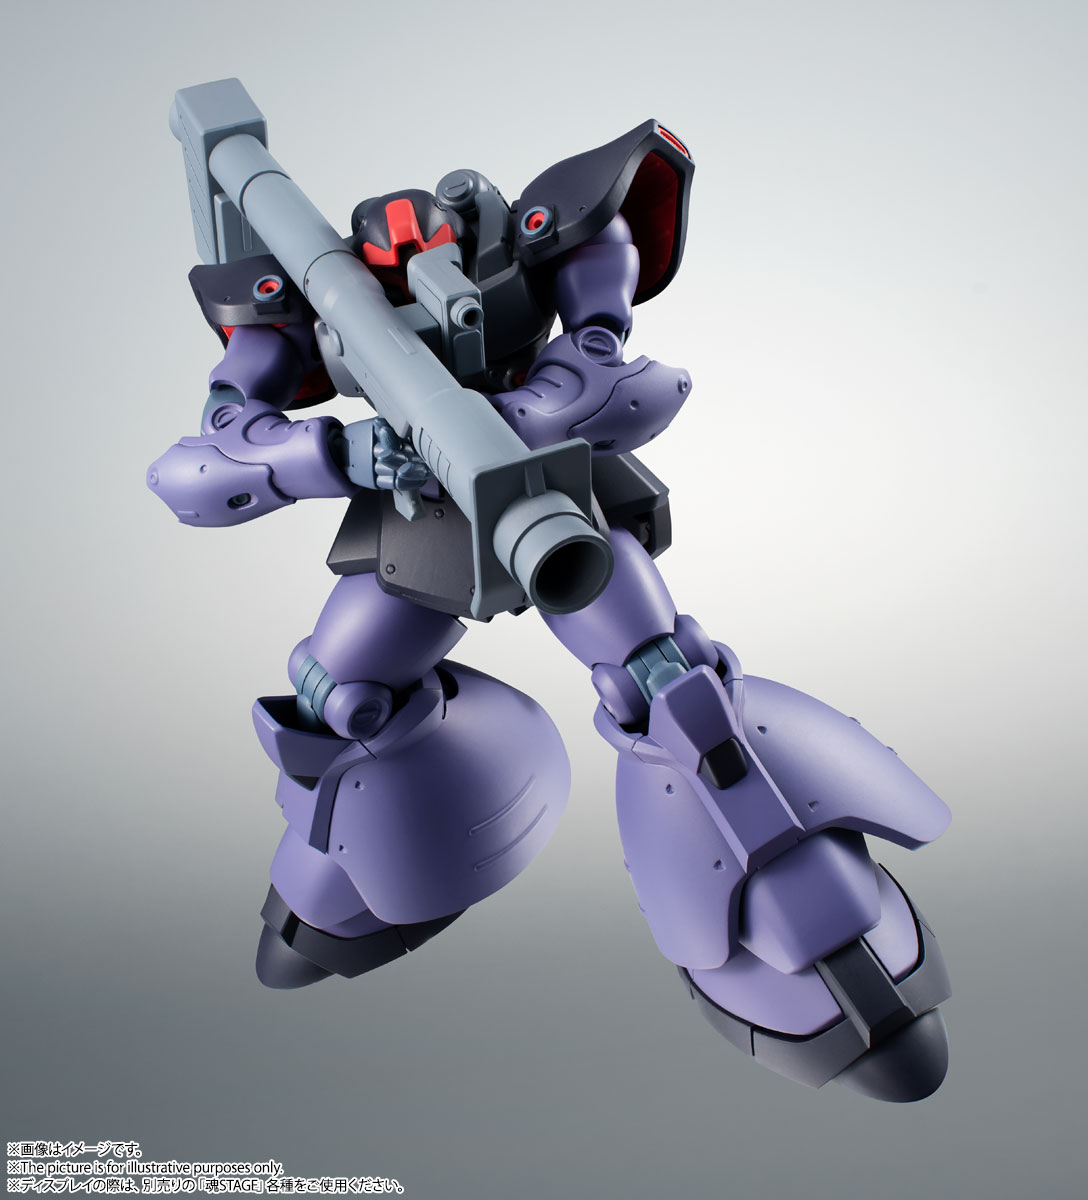 ROBOT魂〈SIDE MS〉『MS-09R-2 リック・ドムⅡ ver. A.N.I.M.E.』機動戦士ガンダム0083 可動フィギュア-006